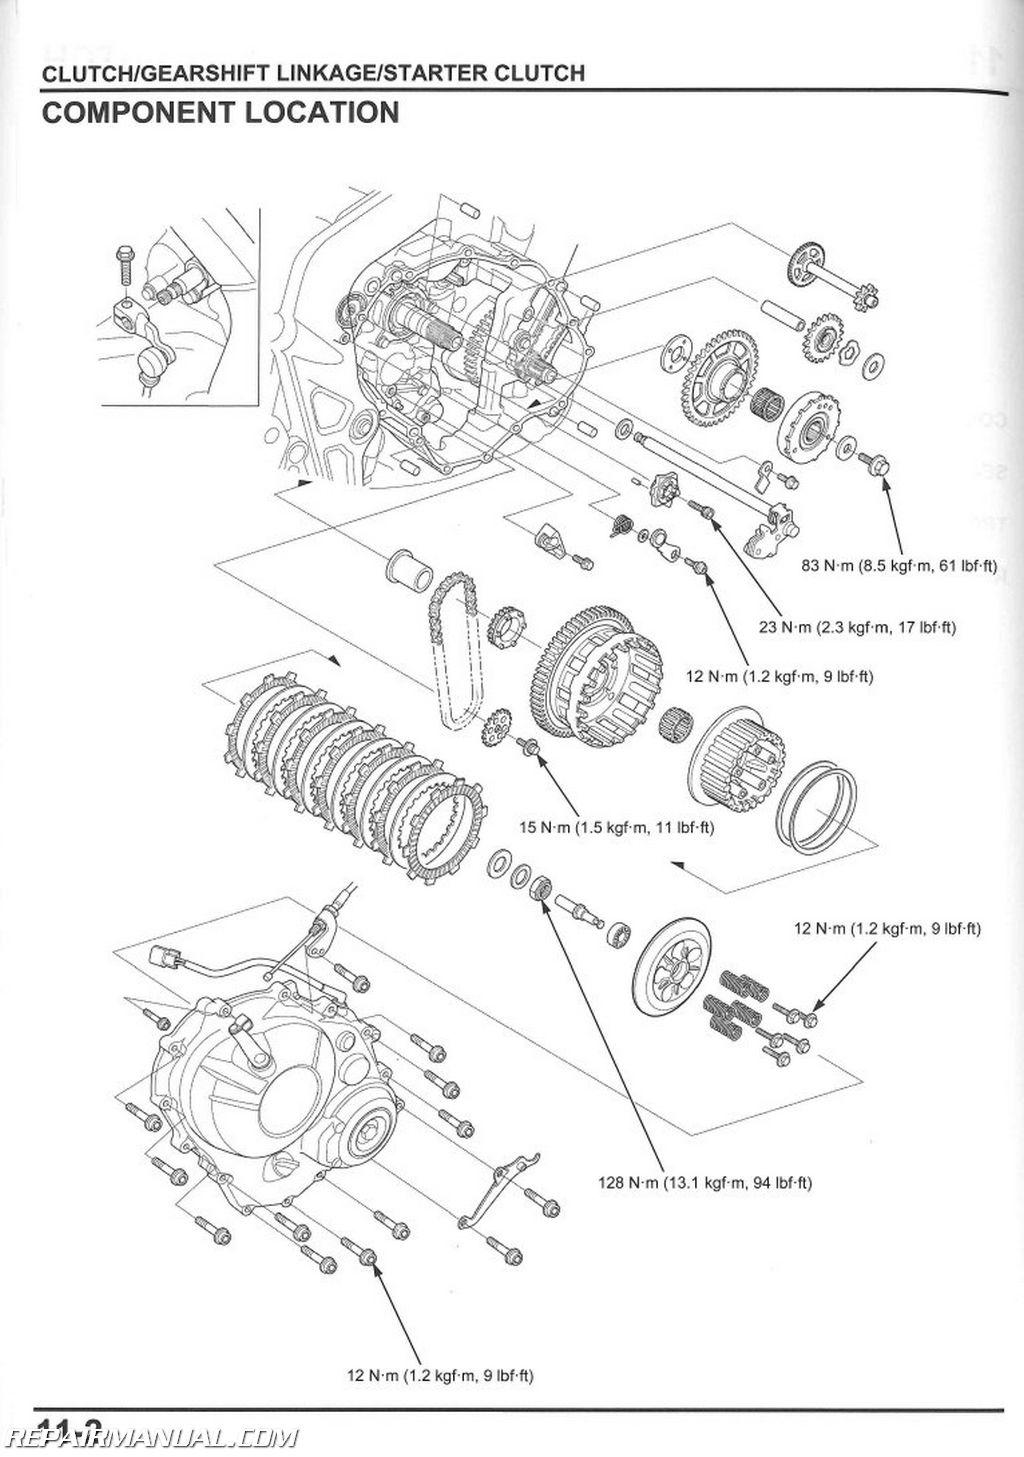 Wiring Diagram Honda Innova : Honda cbr f fa motorcycle service manual